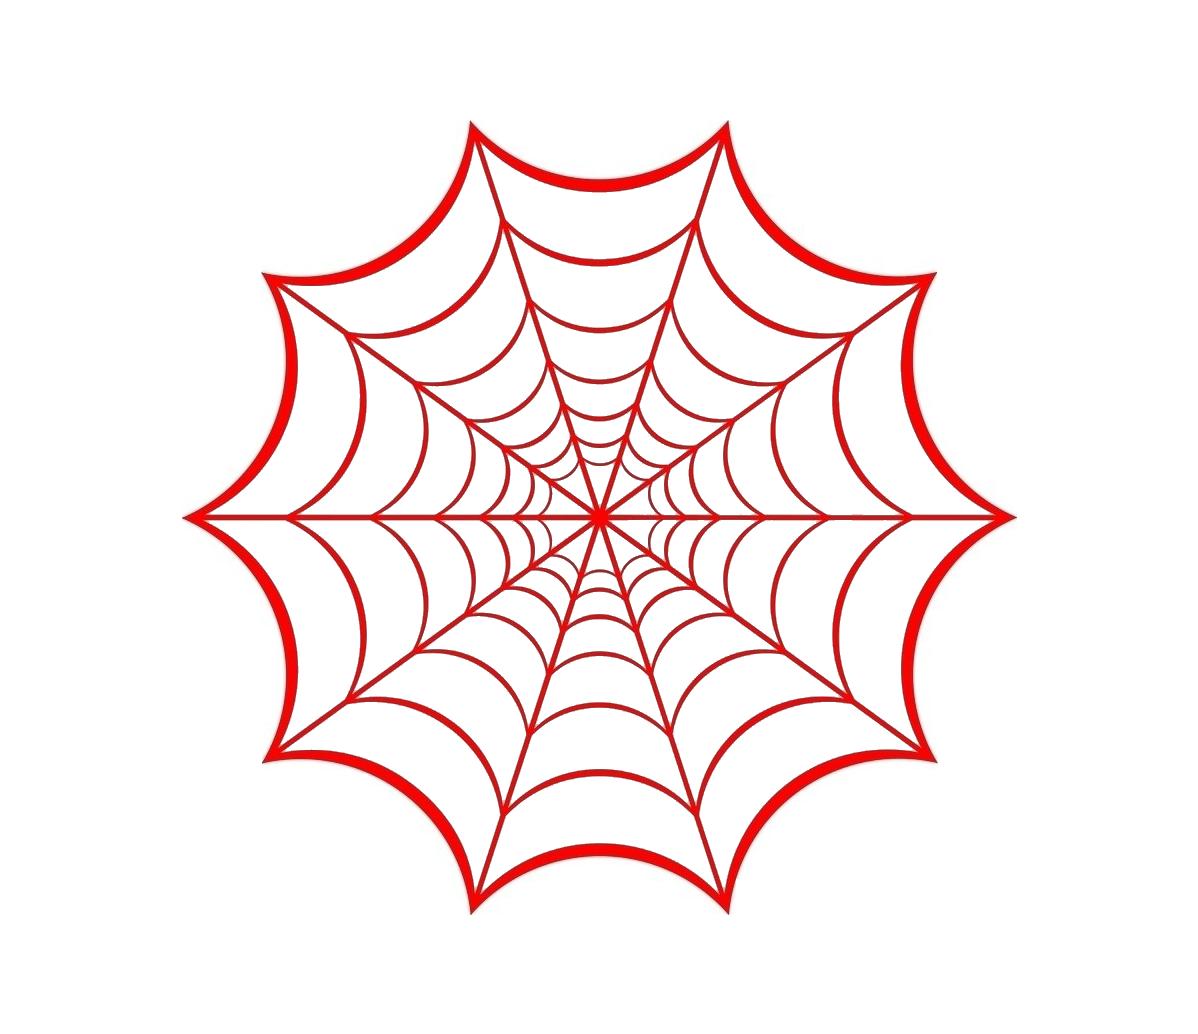 jpg library stock Spider web clip art. Cobweb drawing